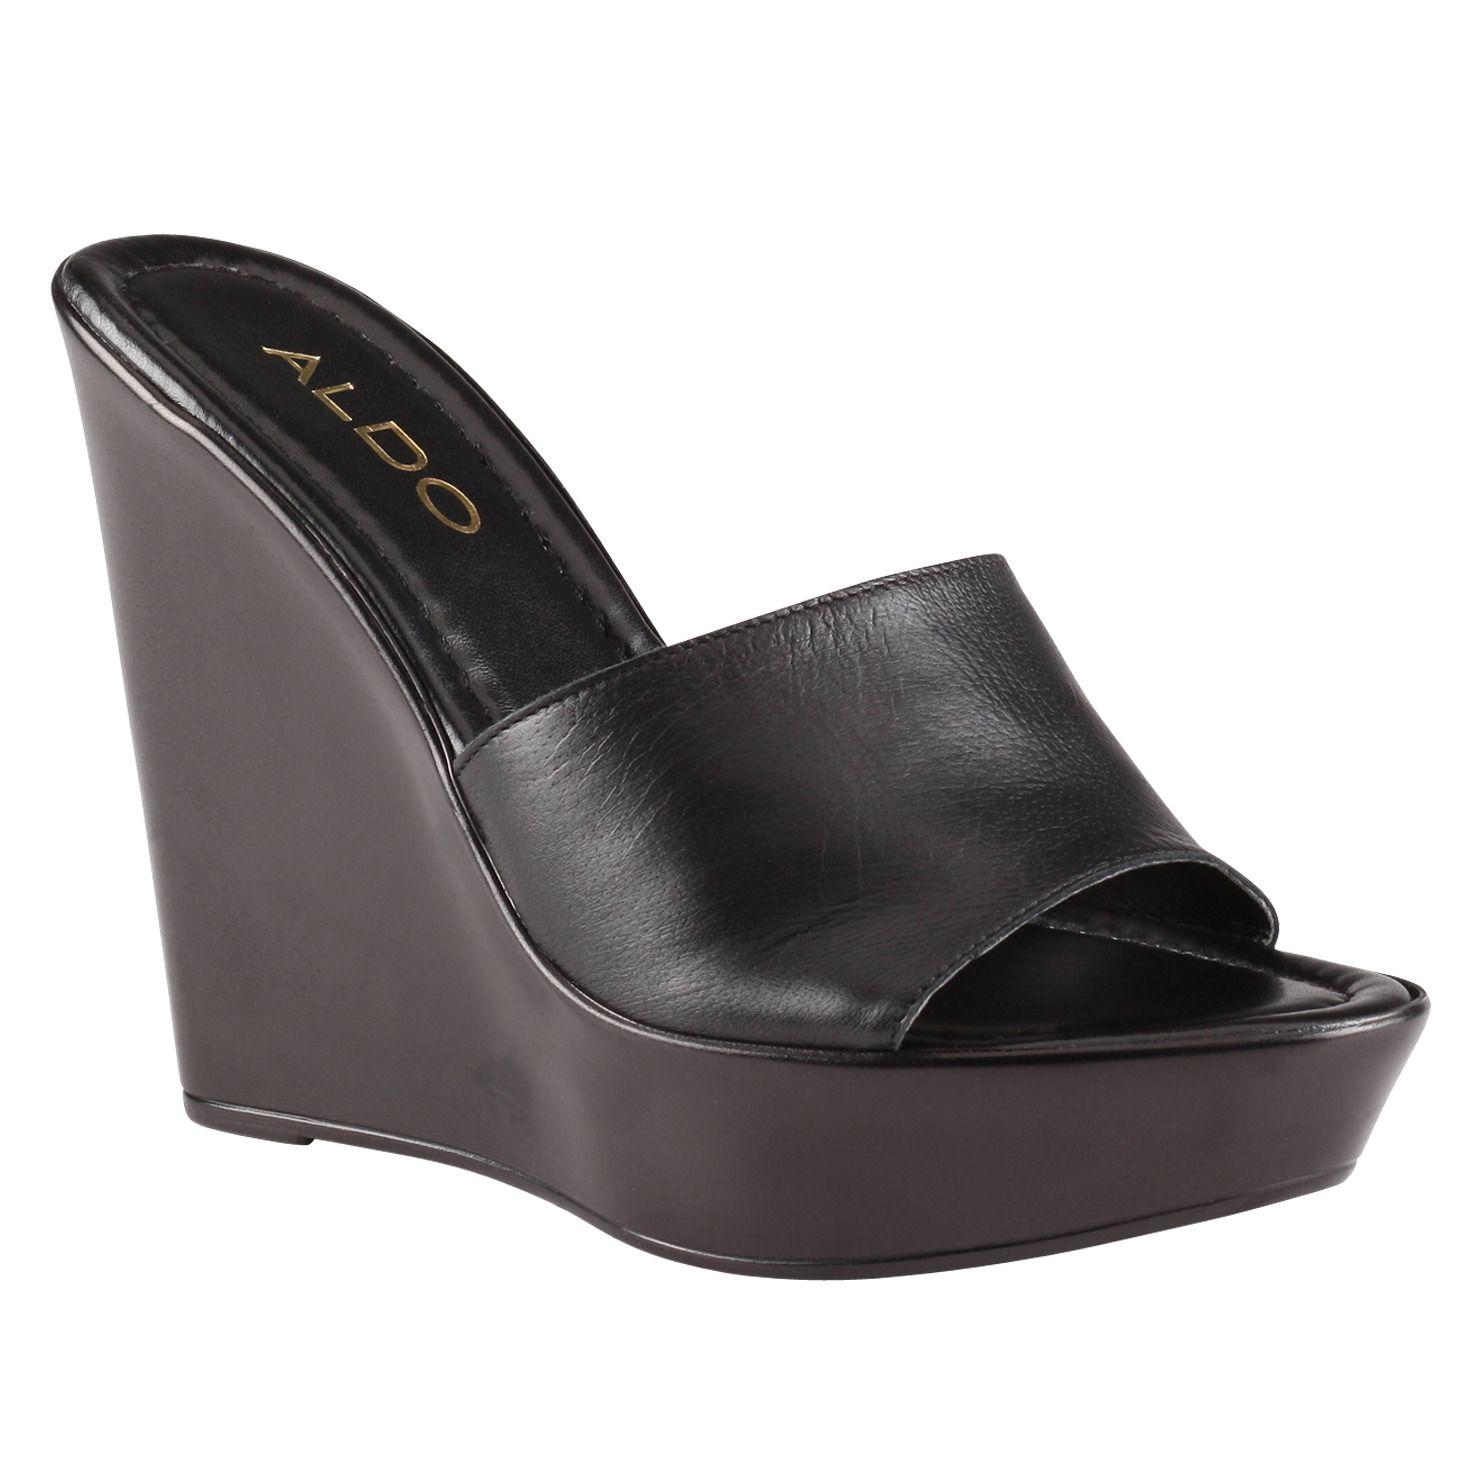 s comforter womens women karlie wedges wedge dexflex suede most comfortable comfort payless black sandal